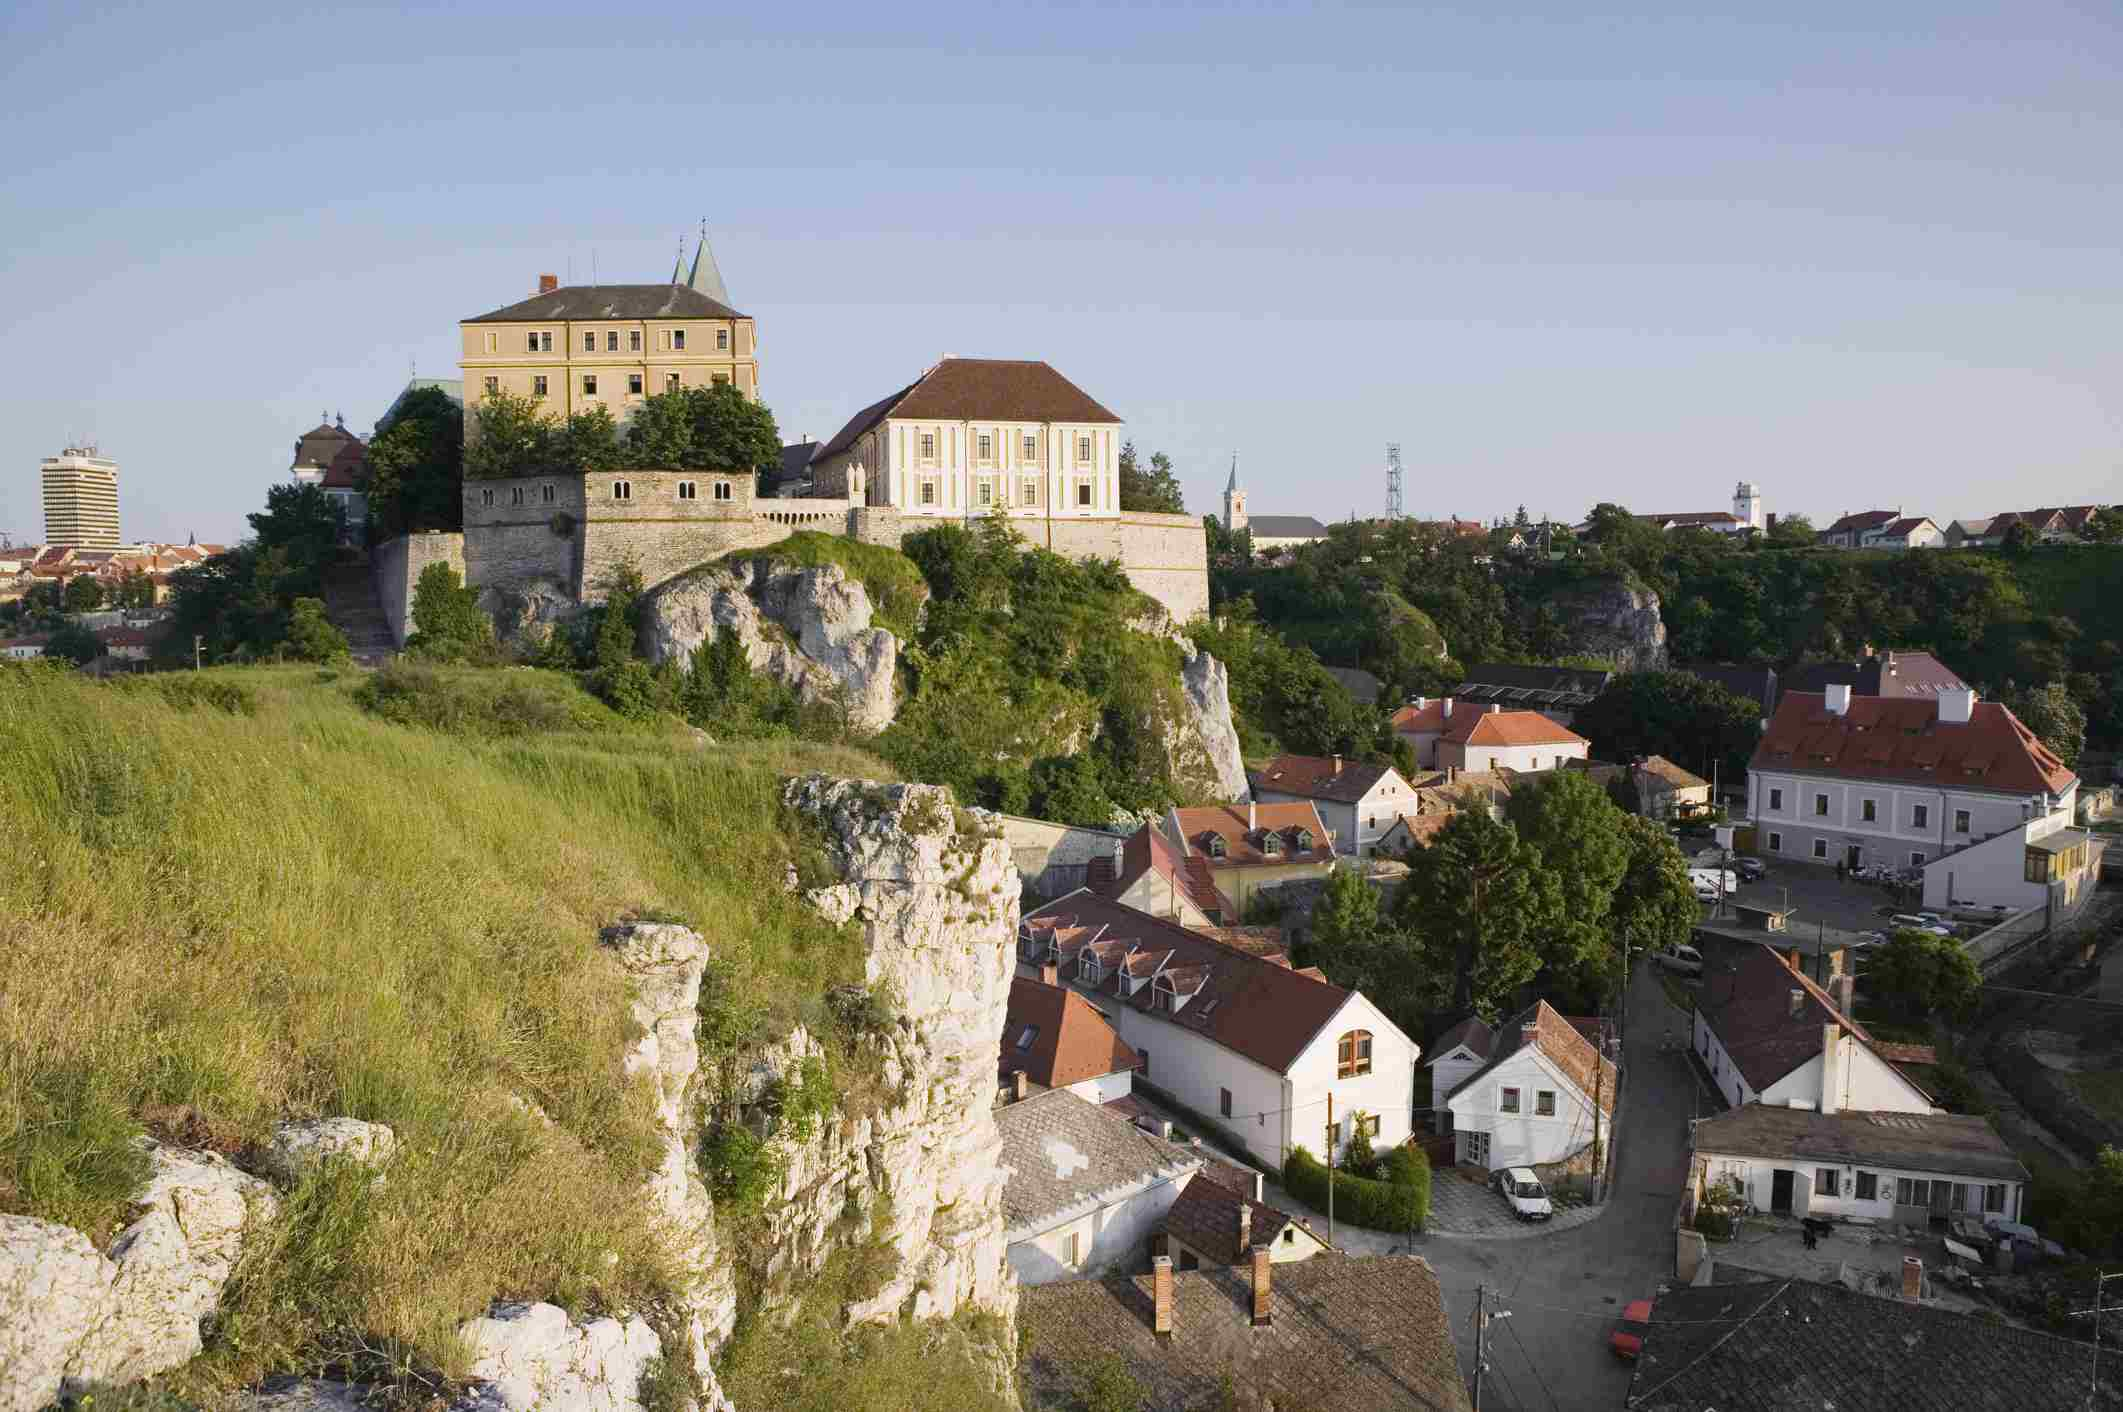 Hungary, Lake Balaton Region, Veszprem, Castle Hill seen from Benedek Hill